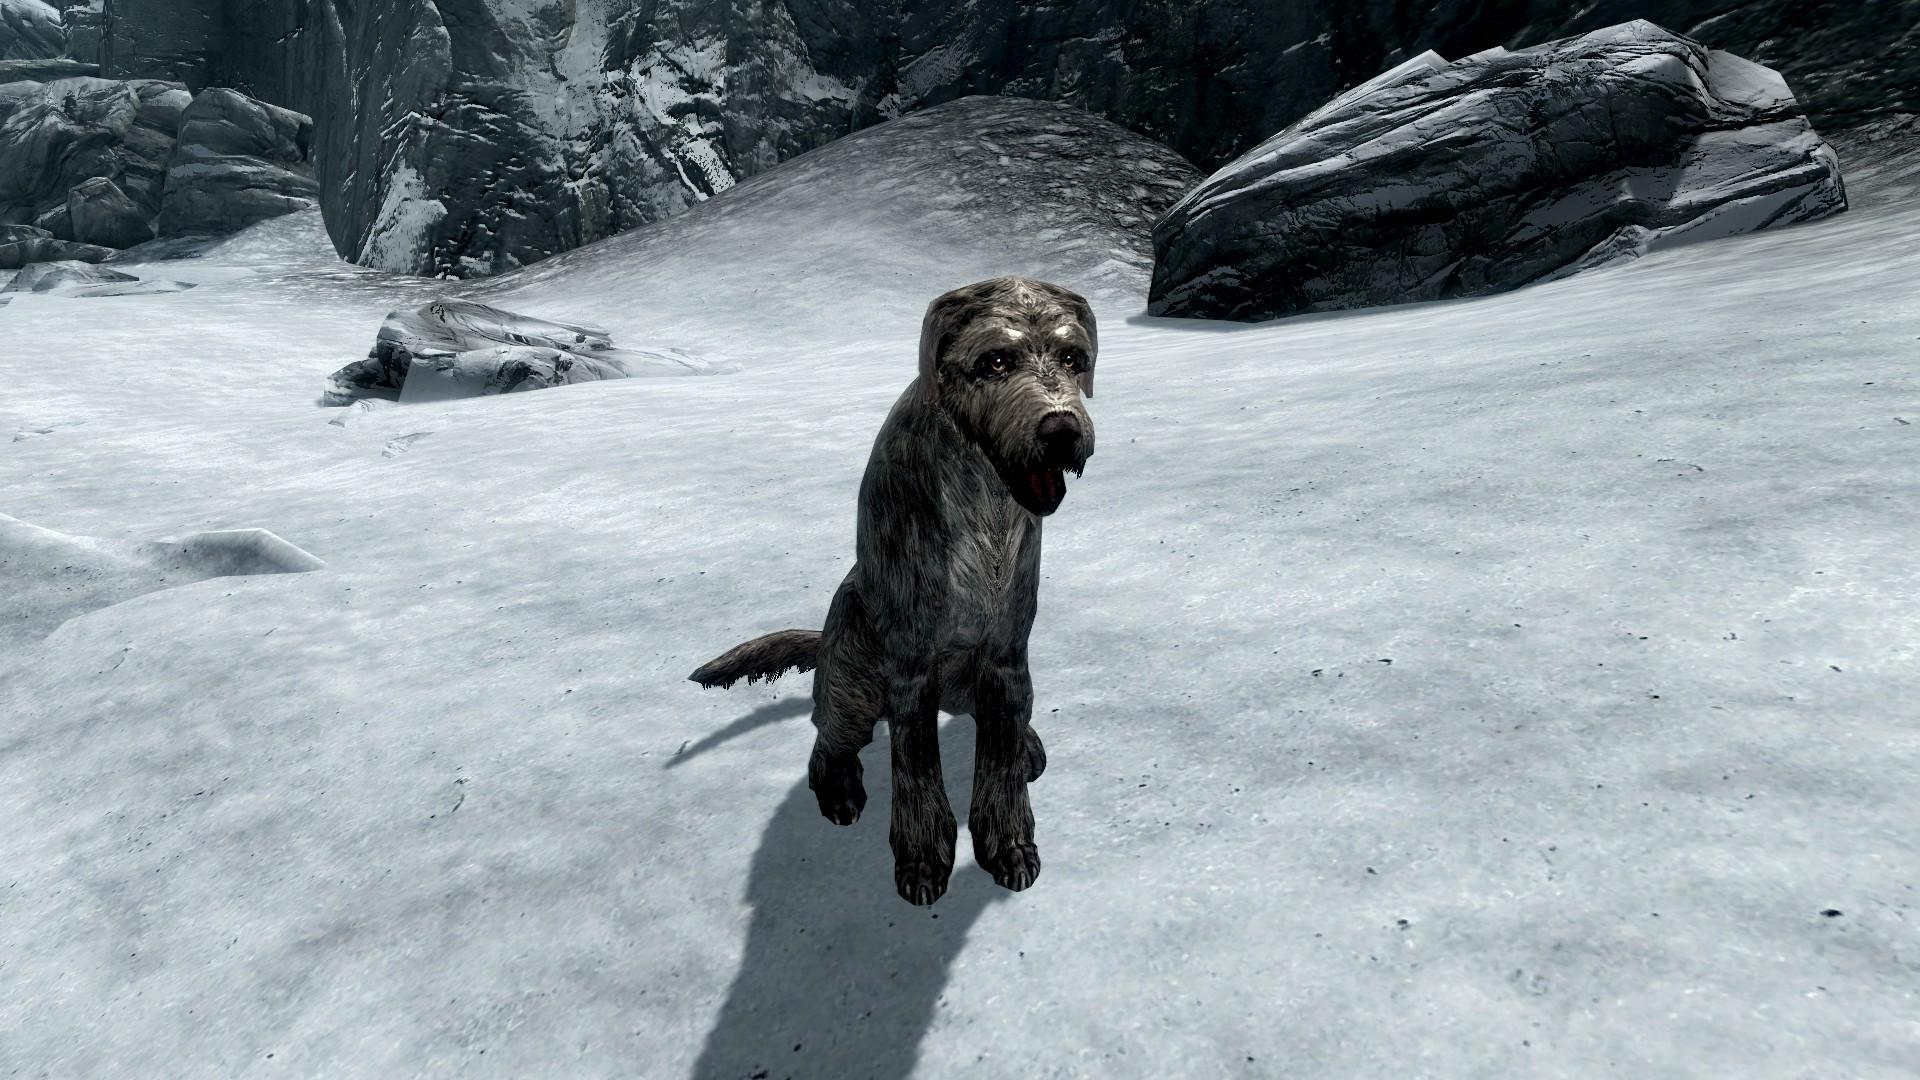 Stray Dog Elder Scrolls FANDOM Powered By Wikia - Stray animals in the us map